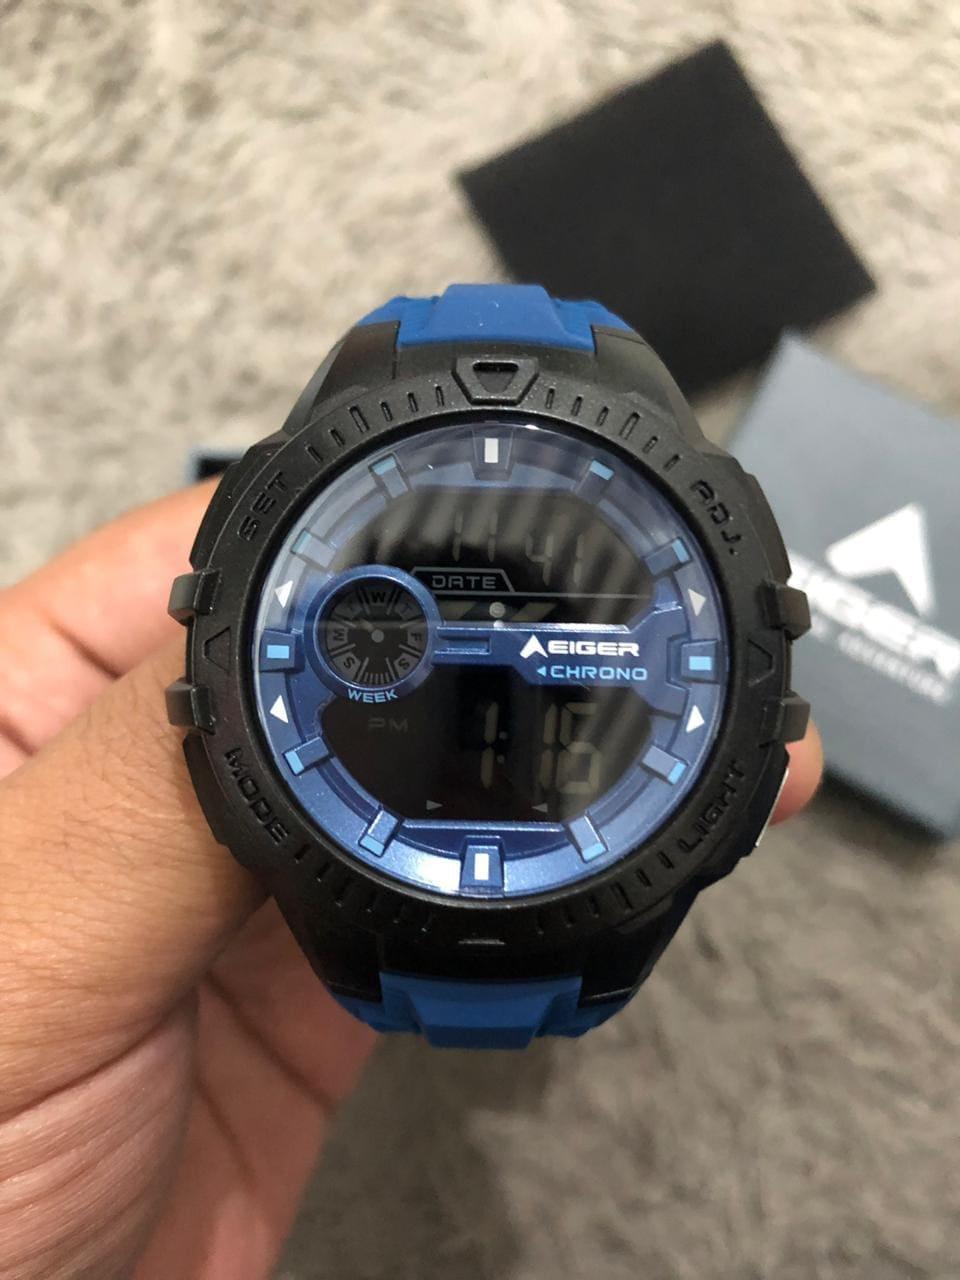 Eiger Jam Tangan - Makalo Digital Watch blue - Water Resistance Digital Watch